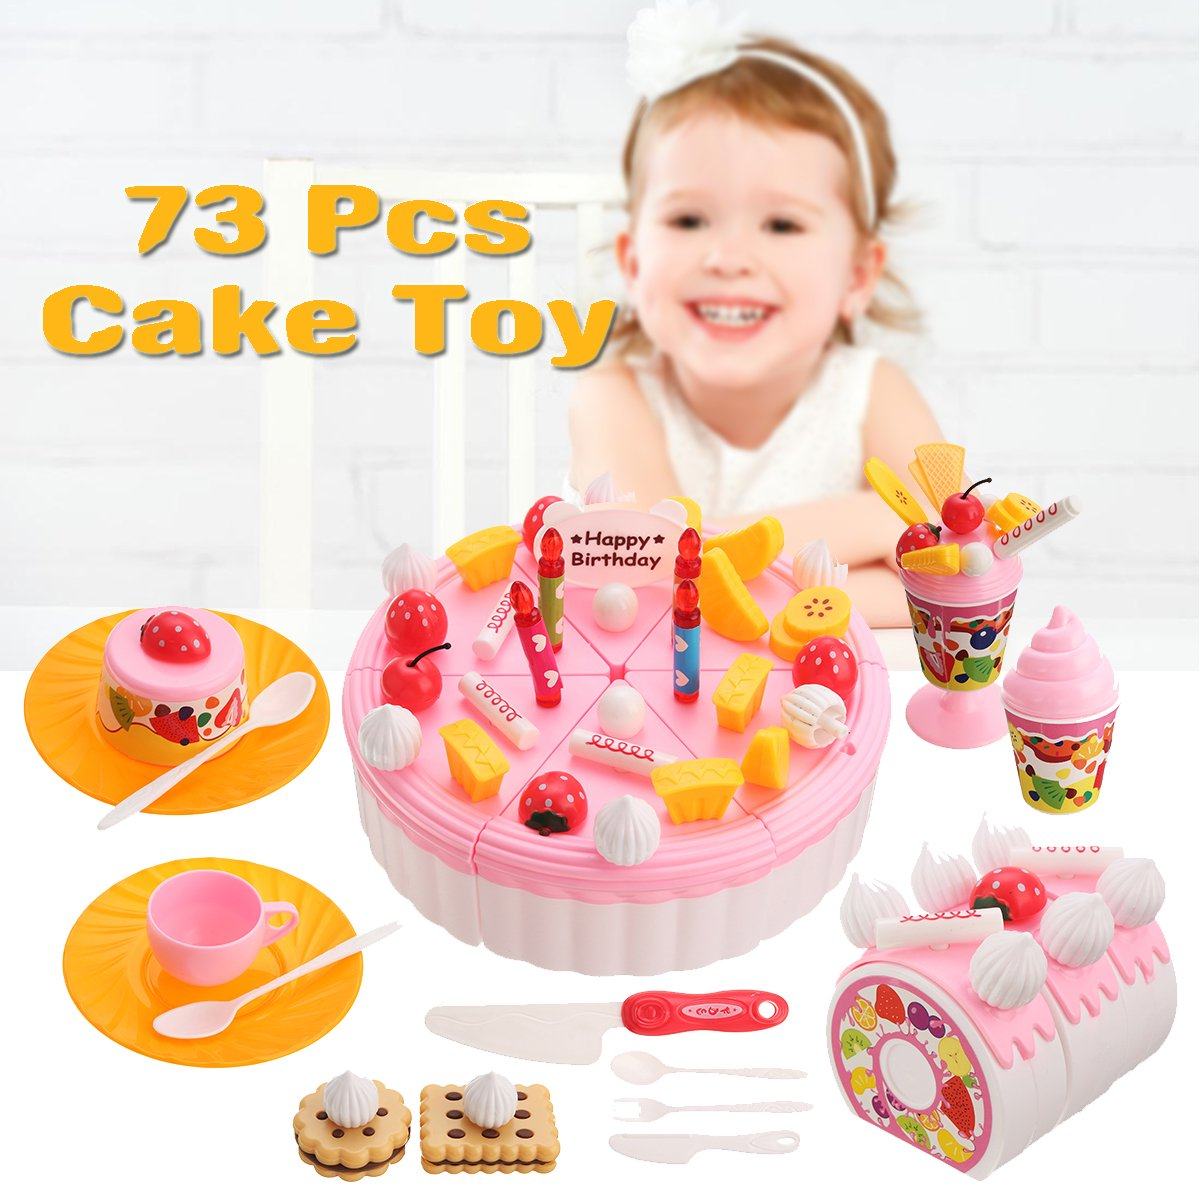 Stupendous 73 Pcs Kitchen Cutting Cake Toy Birthday Cake Pretend Play Food Birthday Cards Printable Nowaargucafe Filternl